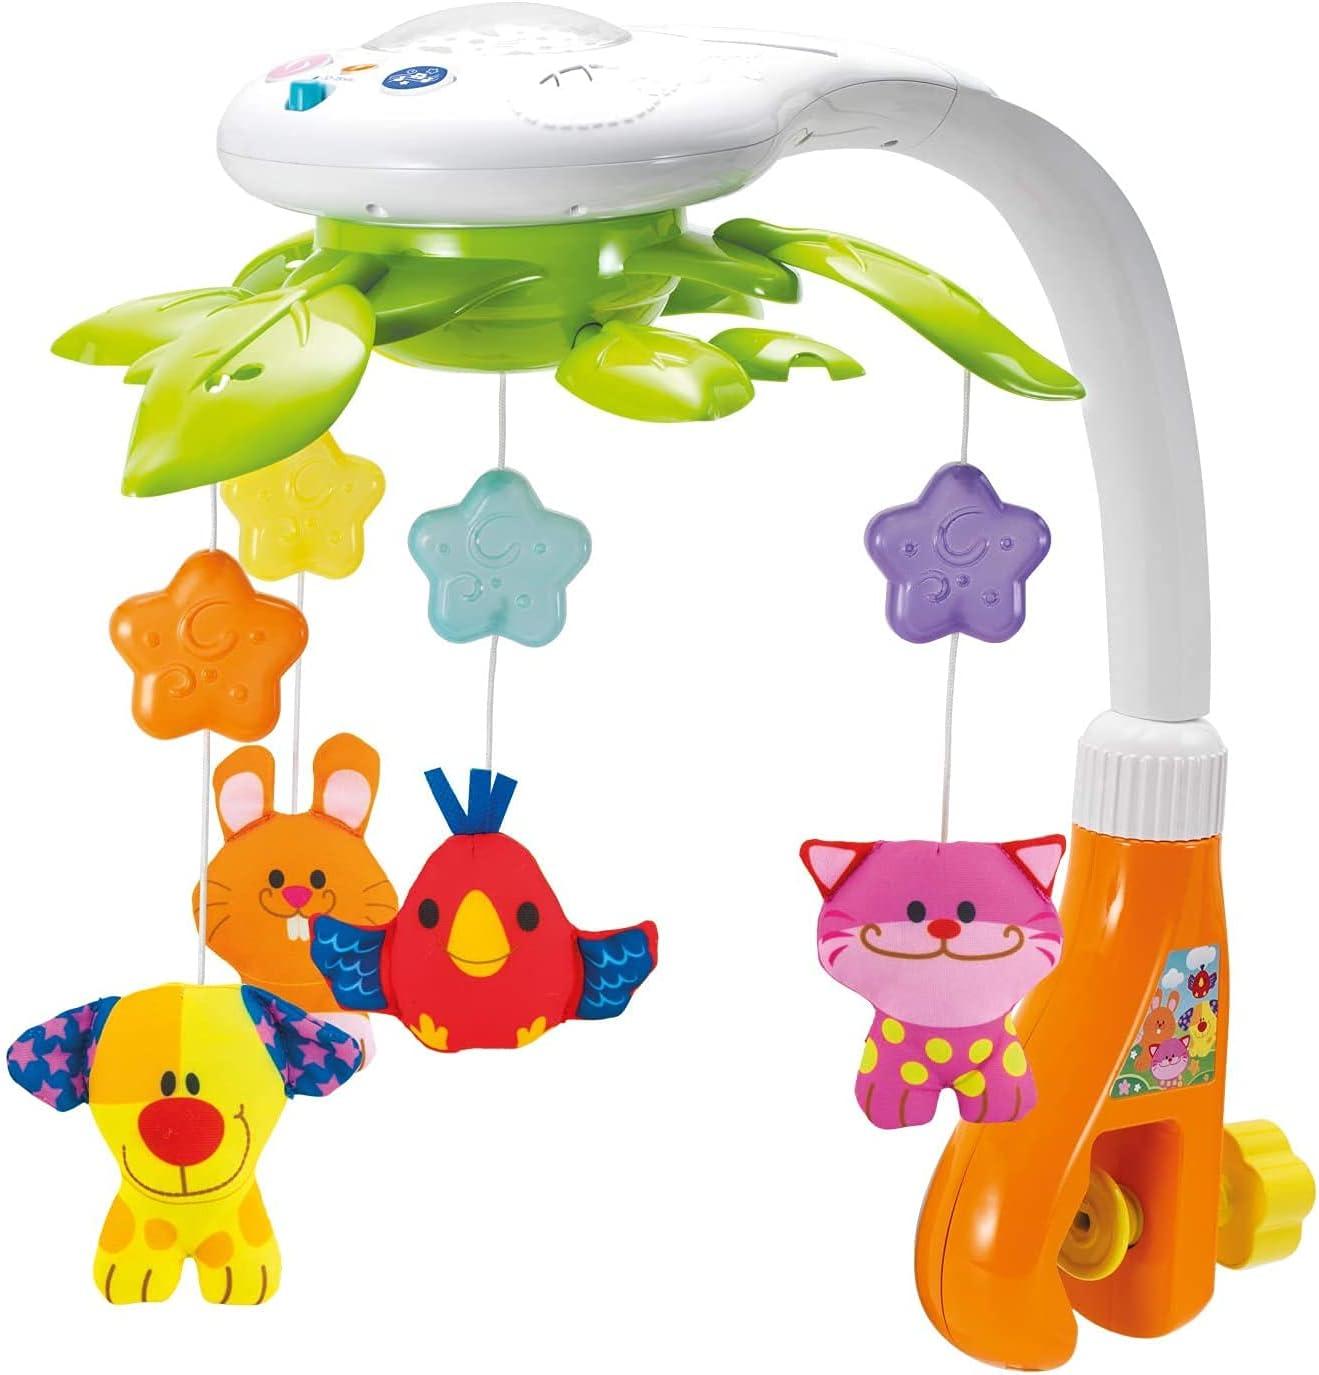 Kiddo Lab Baby Crib Mobile